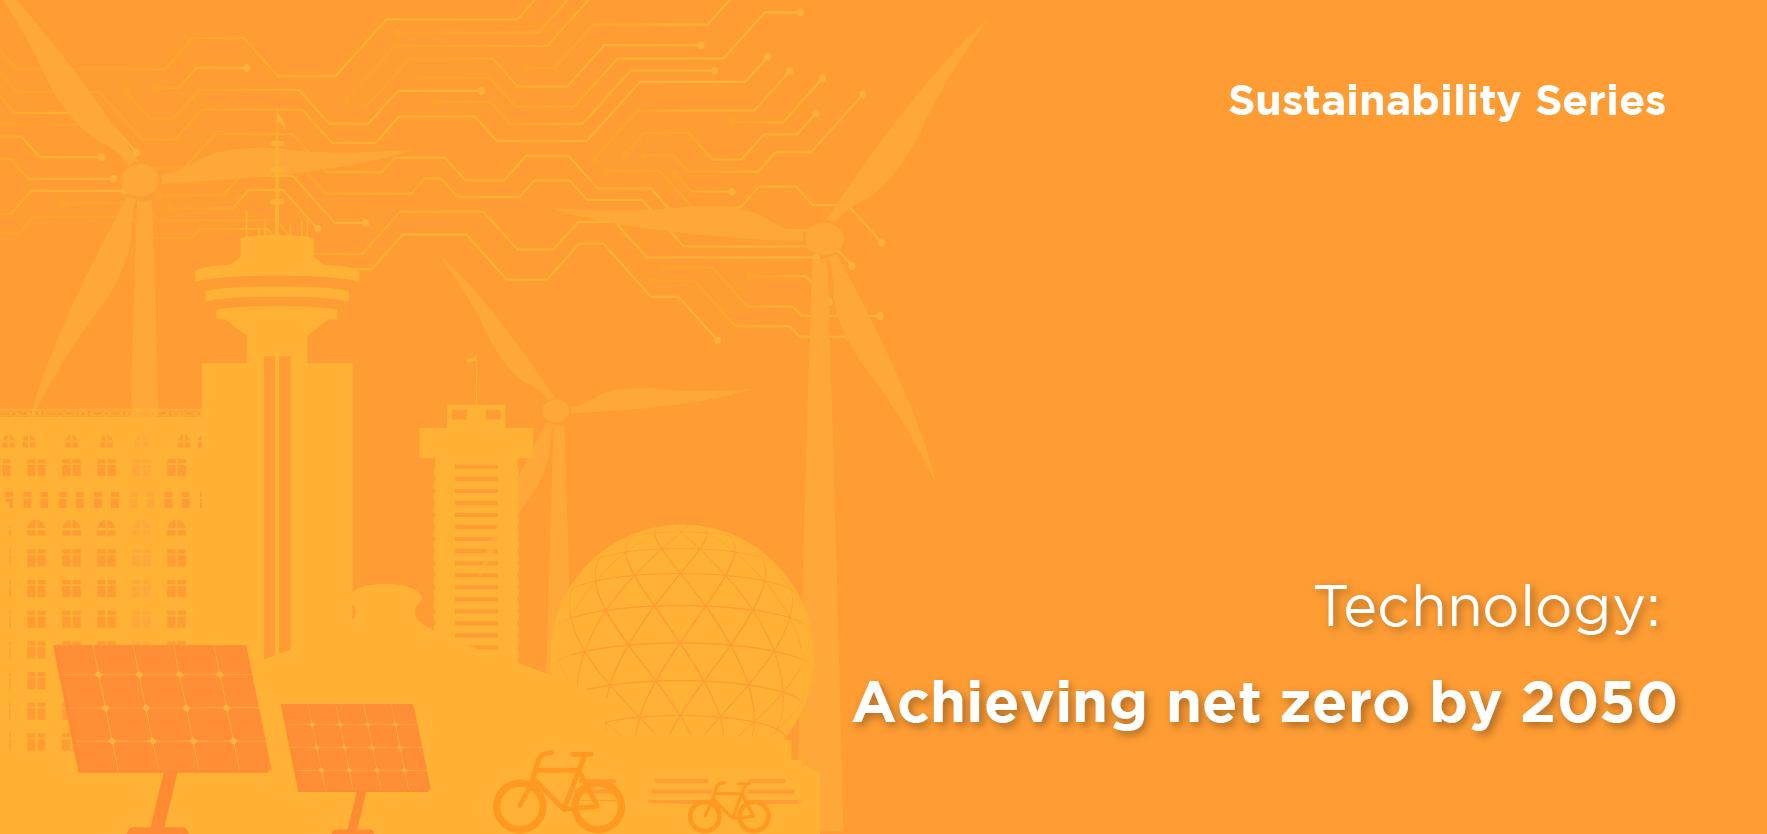 Sustainability Series